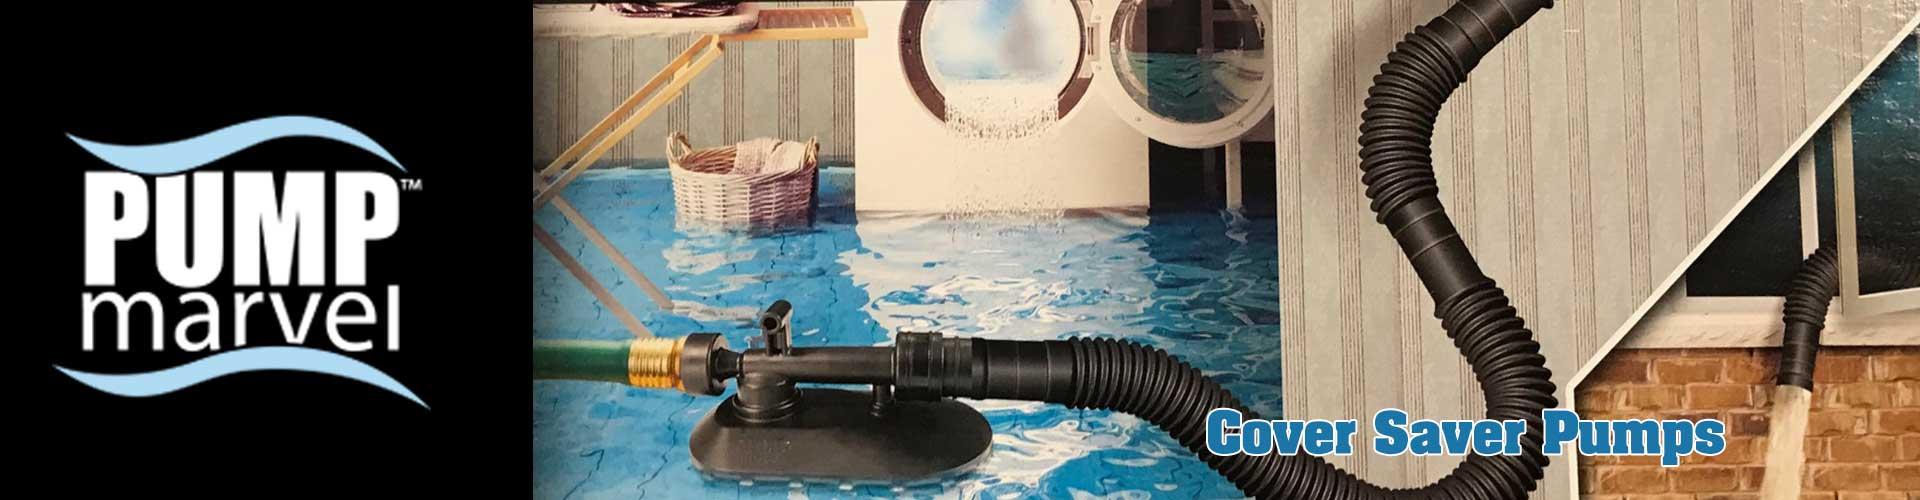 Cover Saver Pumps